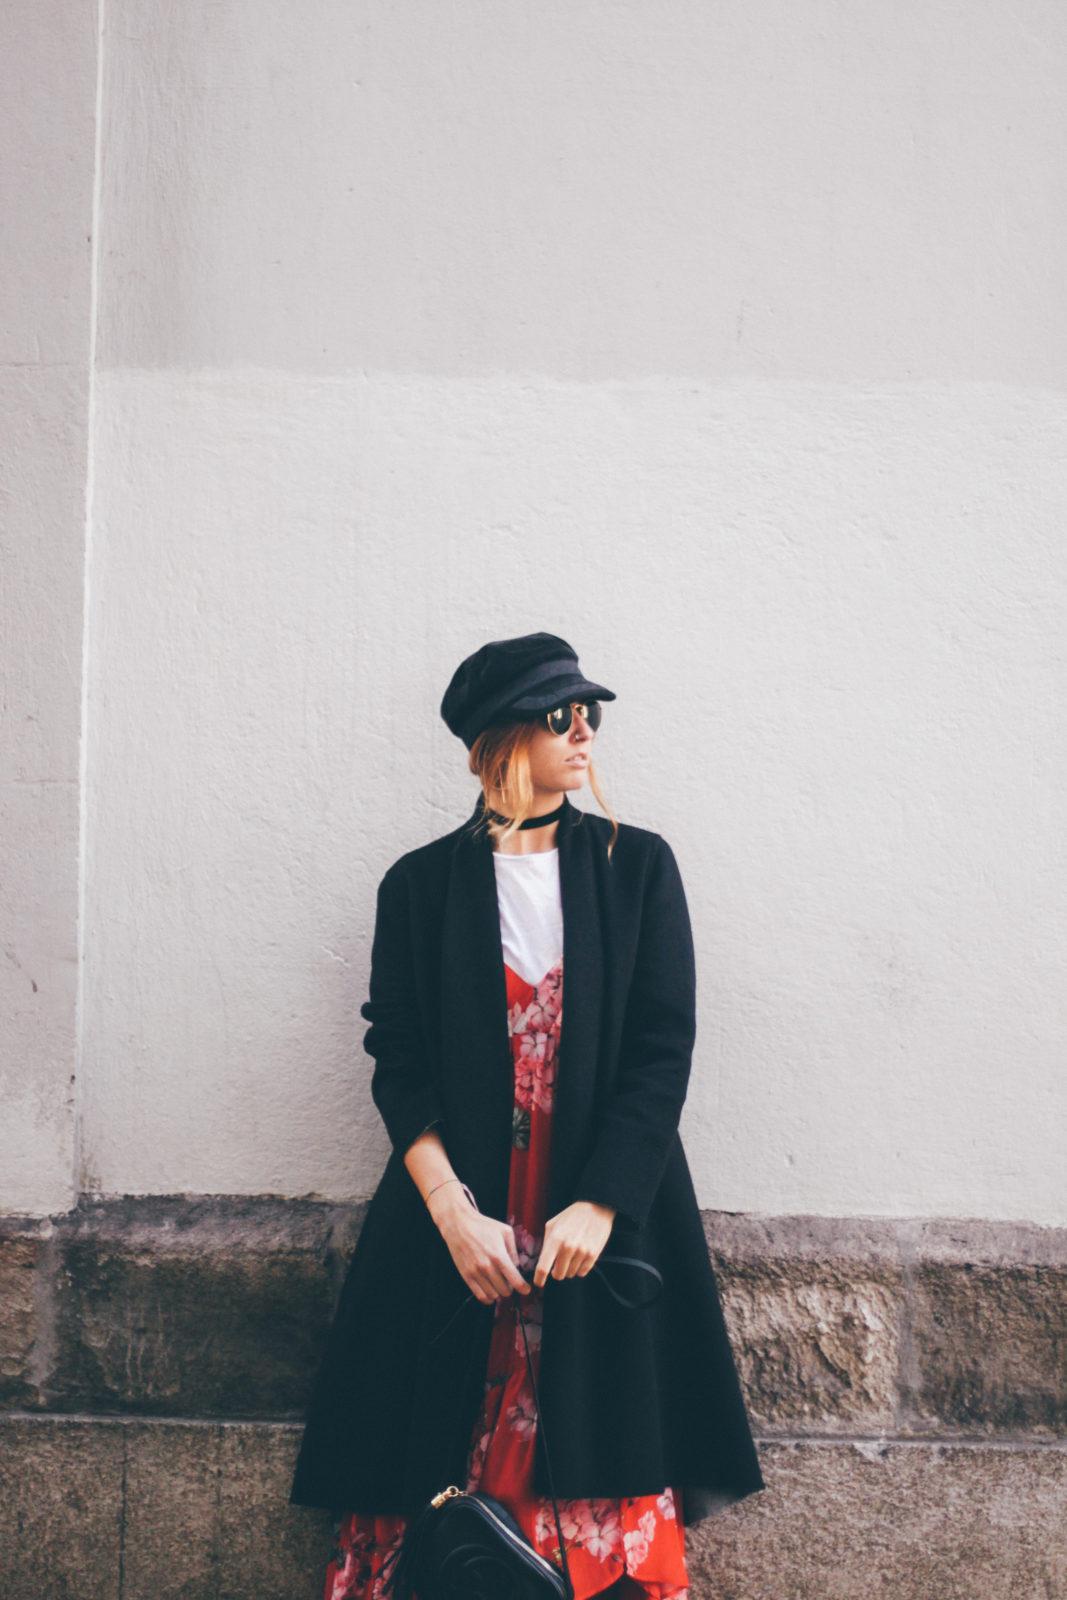 baker_boy_hat_vestido_con_camiseta_gorra_marinera_botines_hebillas_fall_2016_trends_street_style_outfits_donkeycool-24